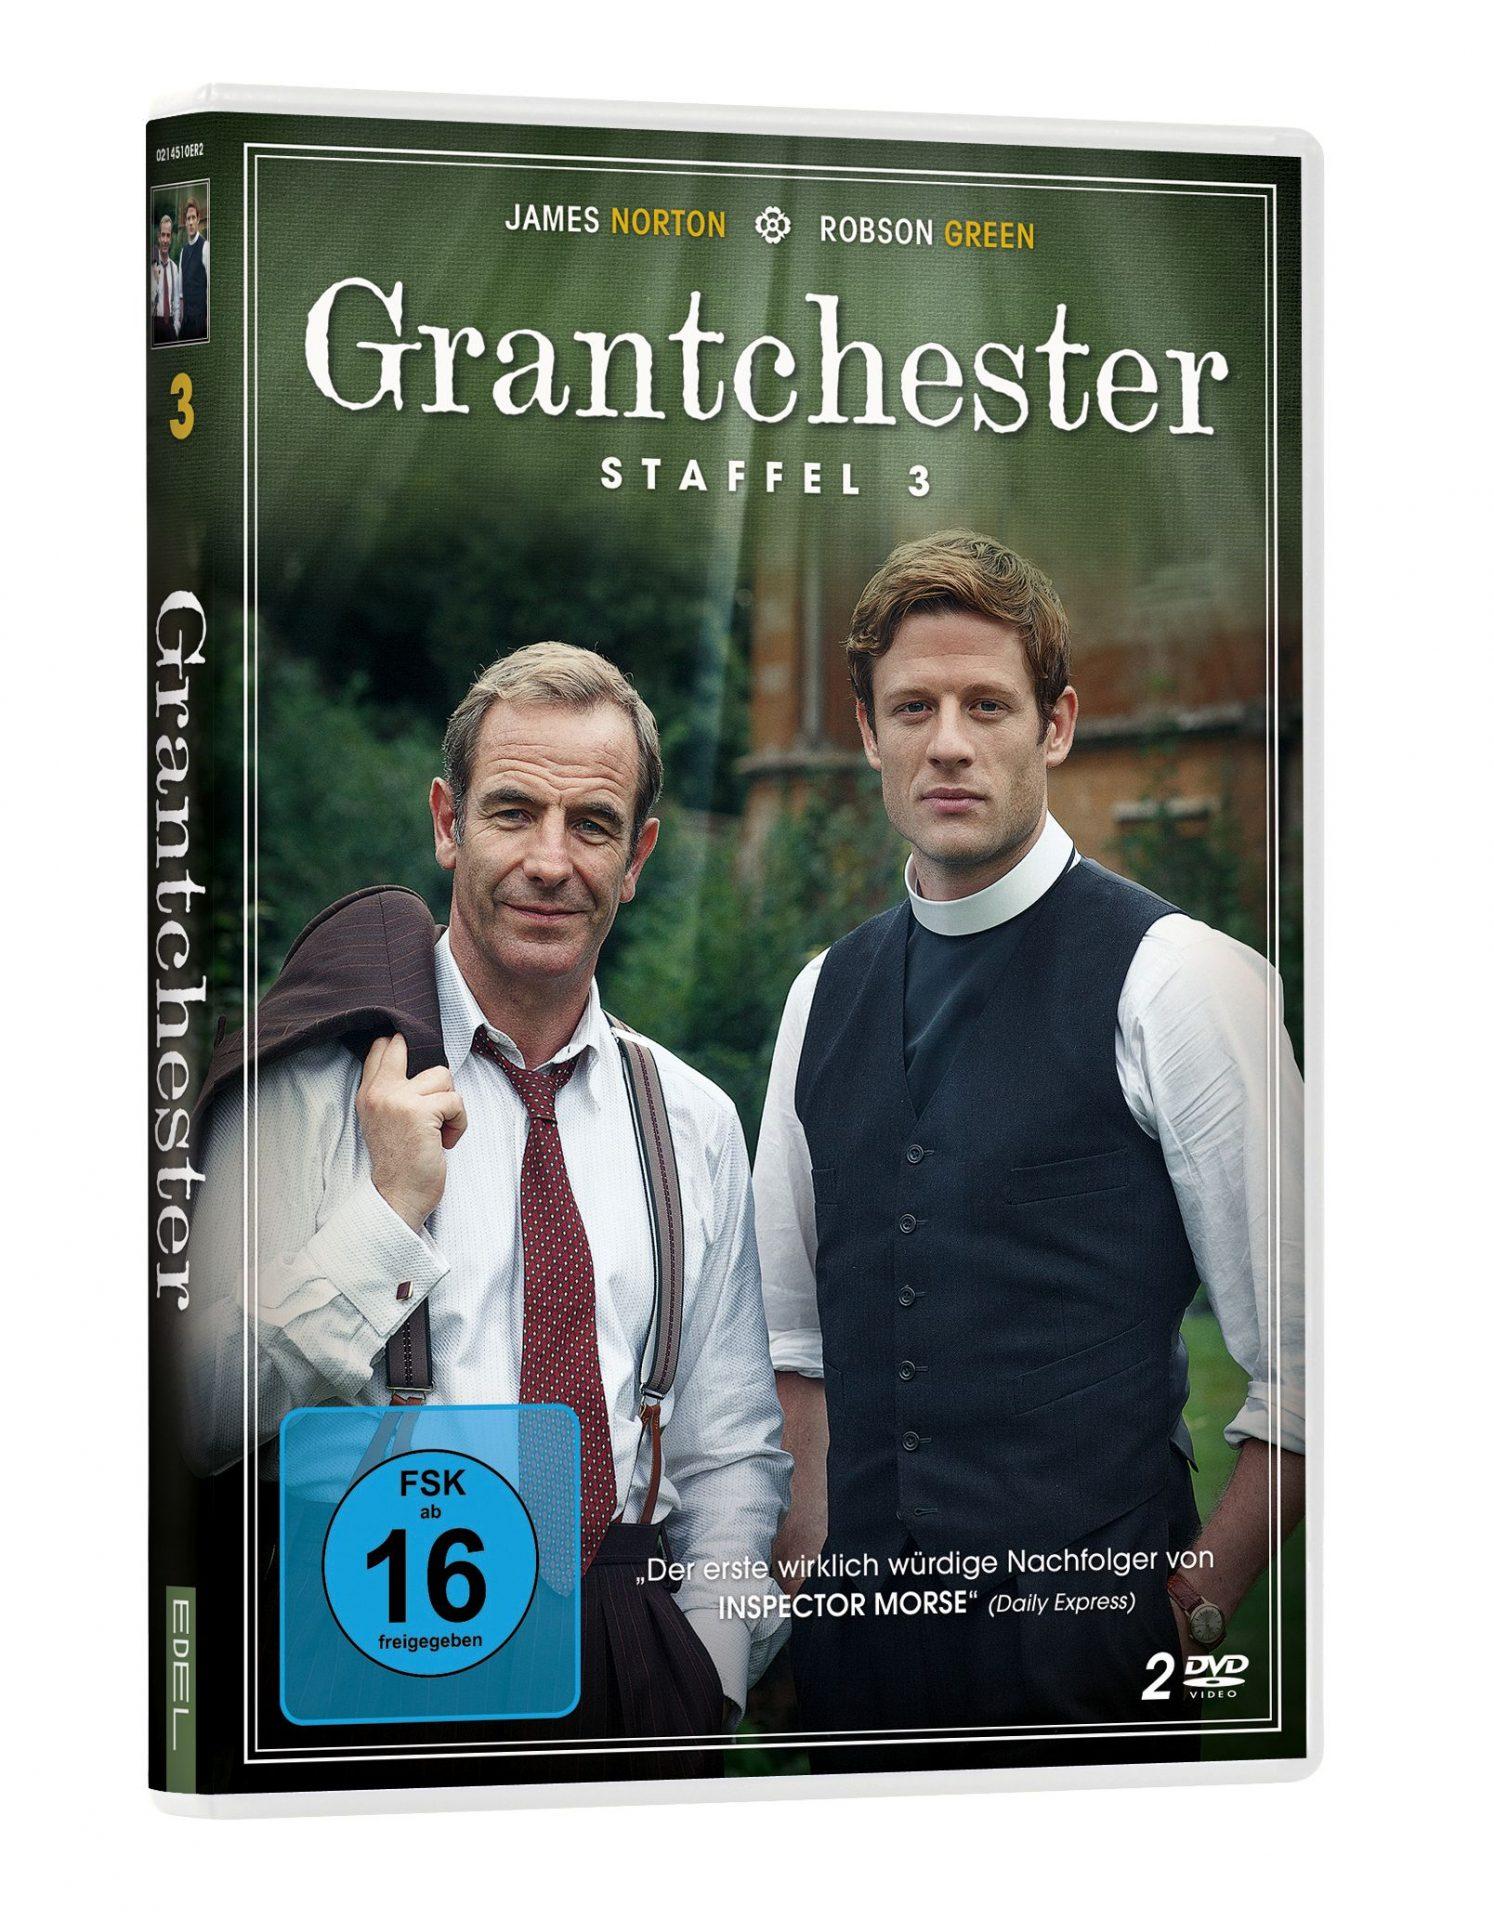 Grantchester - Staffel 3 DVD